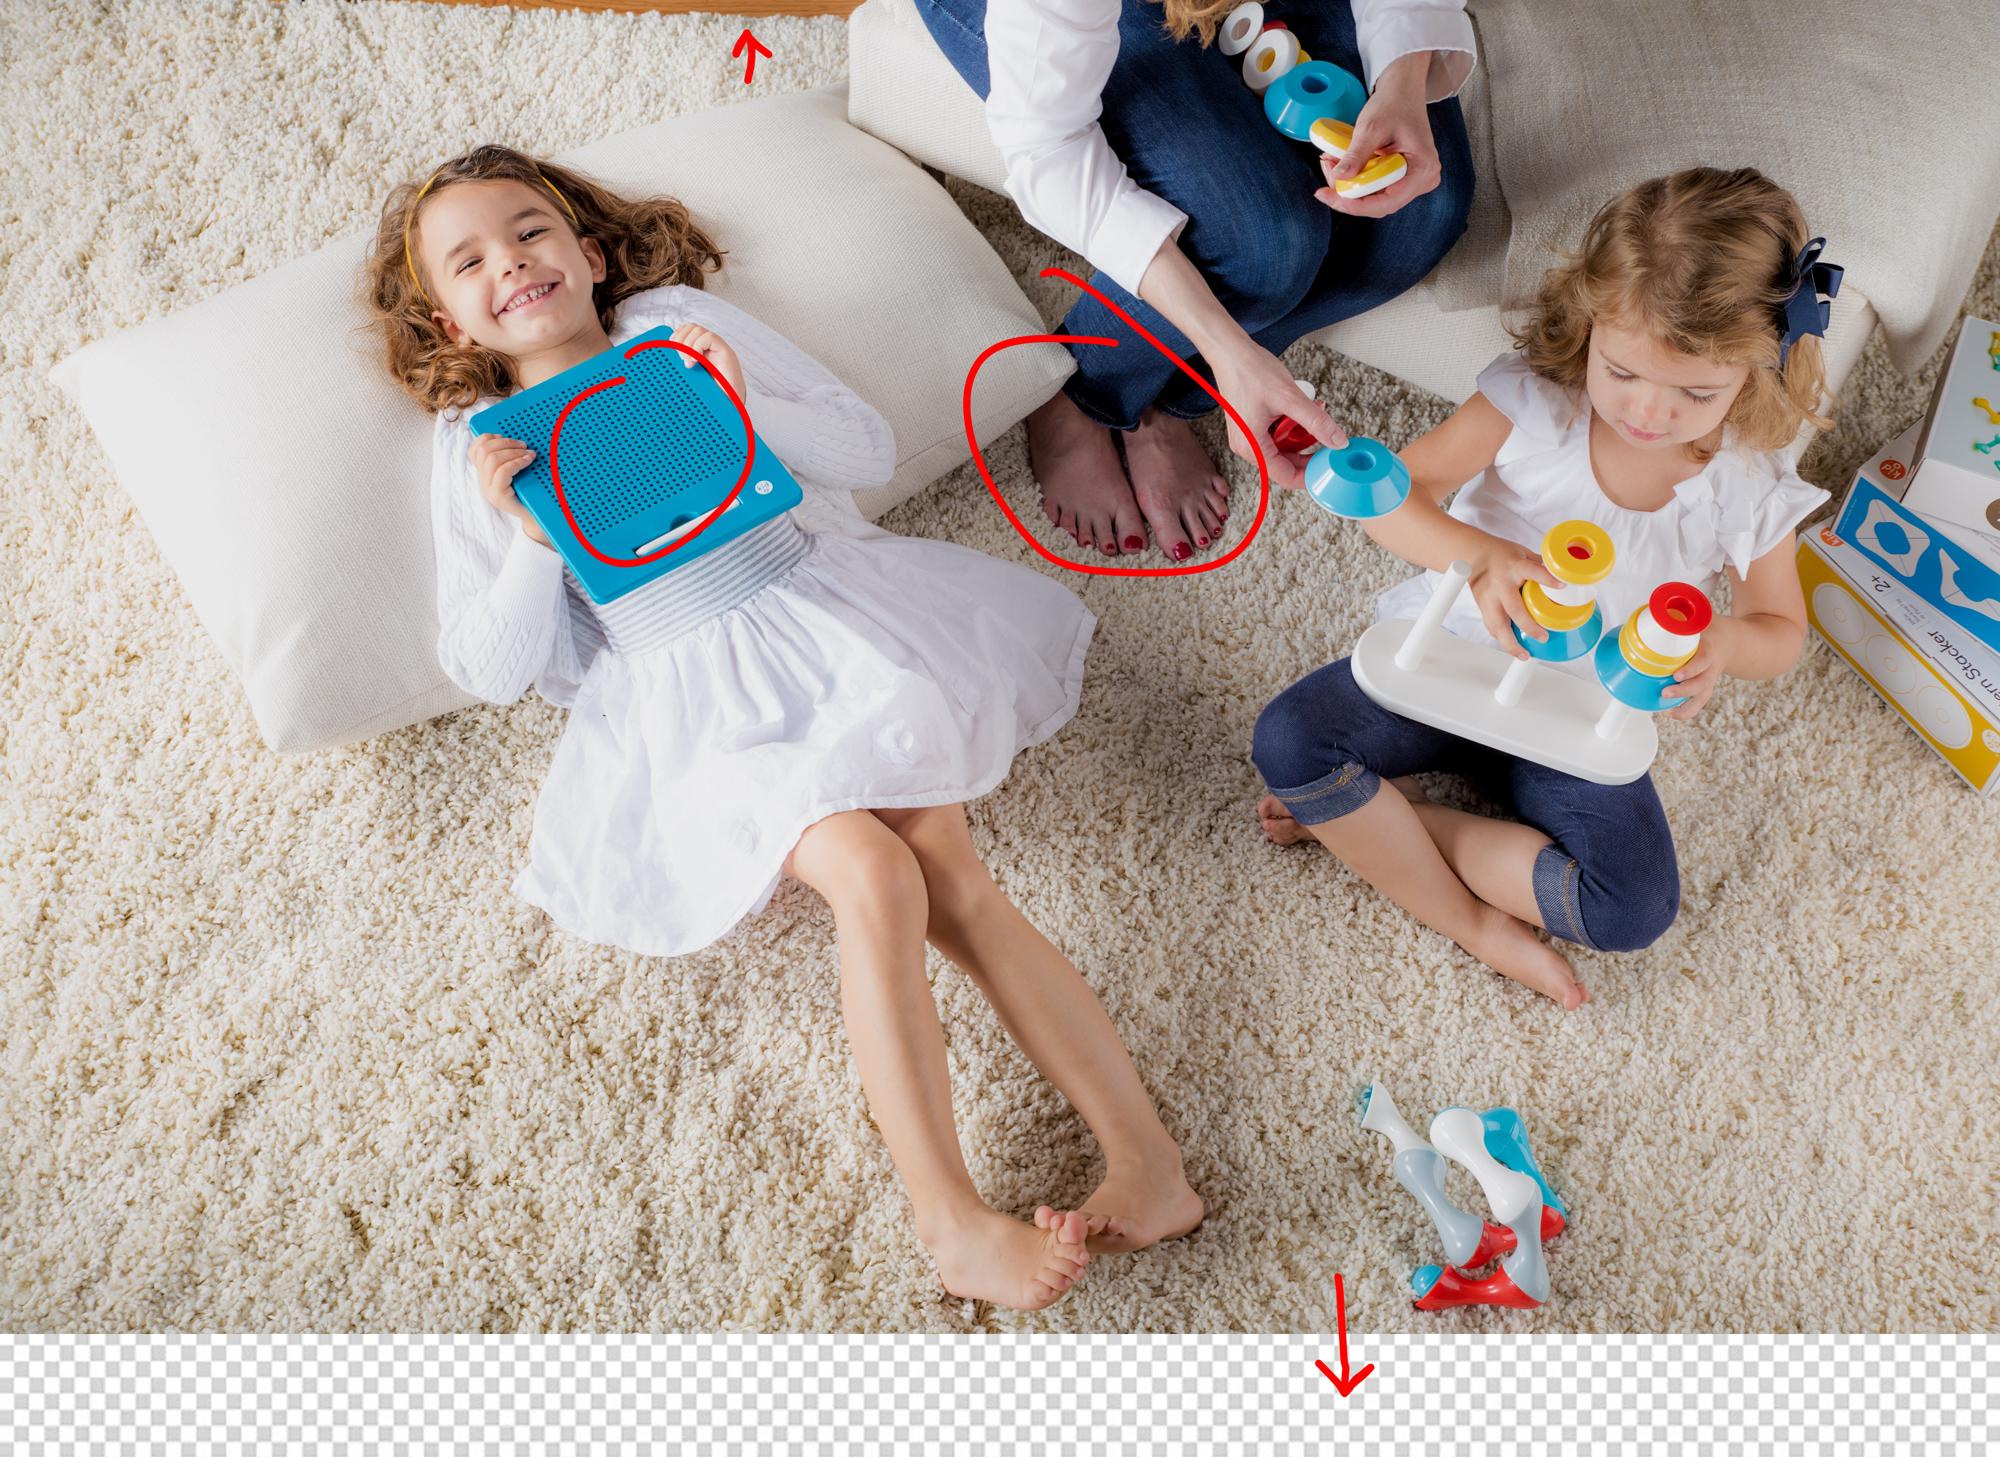 Catalog_Kids_2015-187-Edit_Before2.jpg